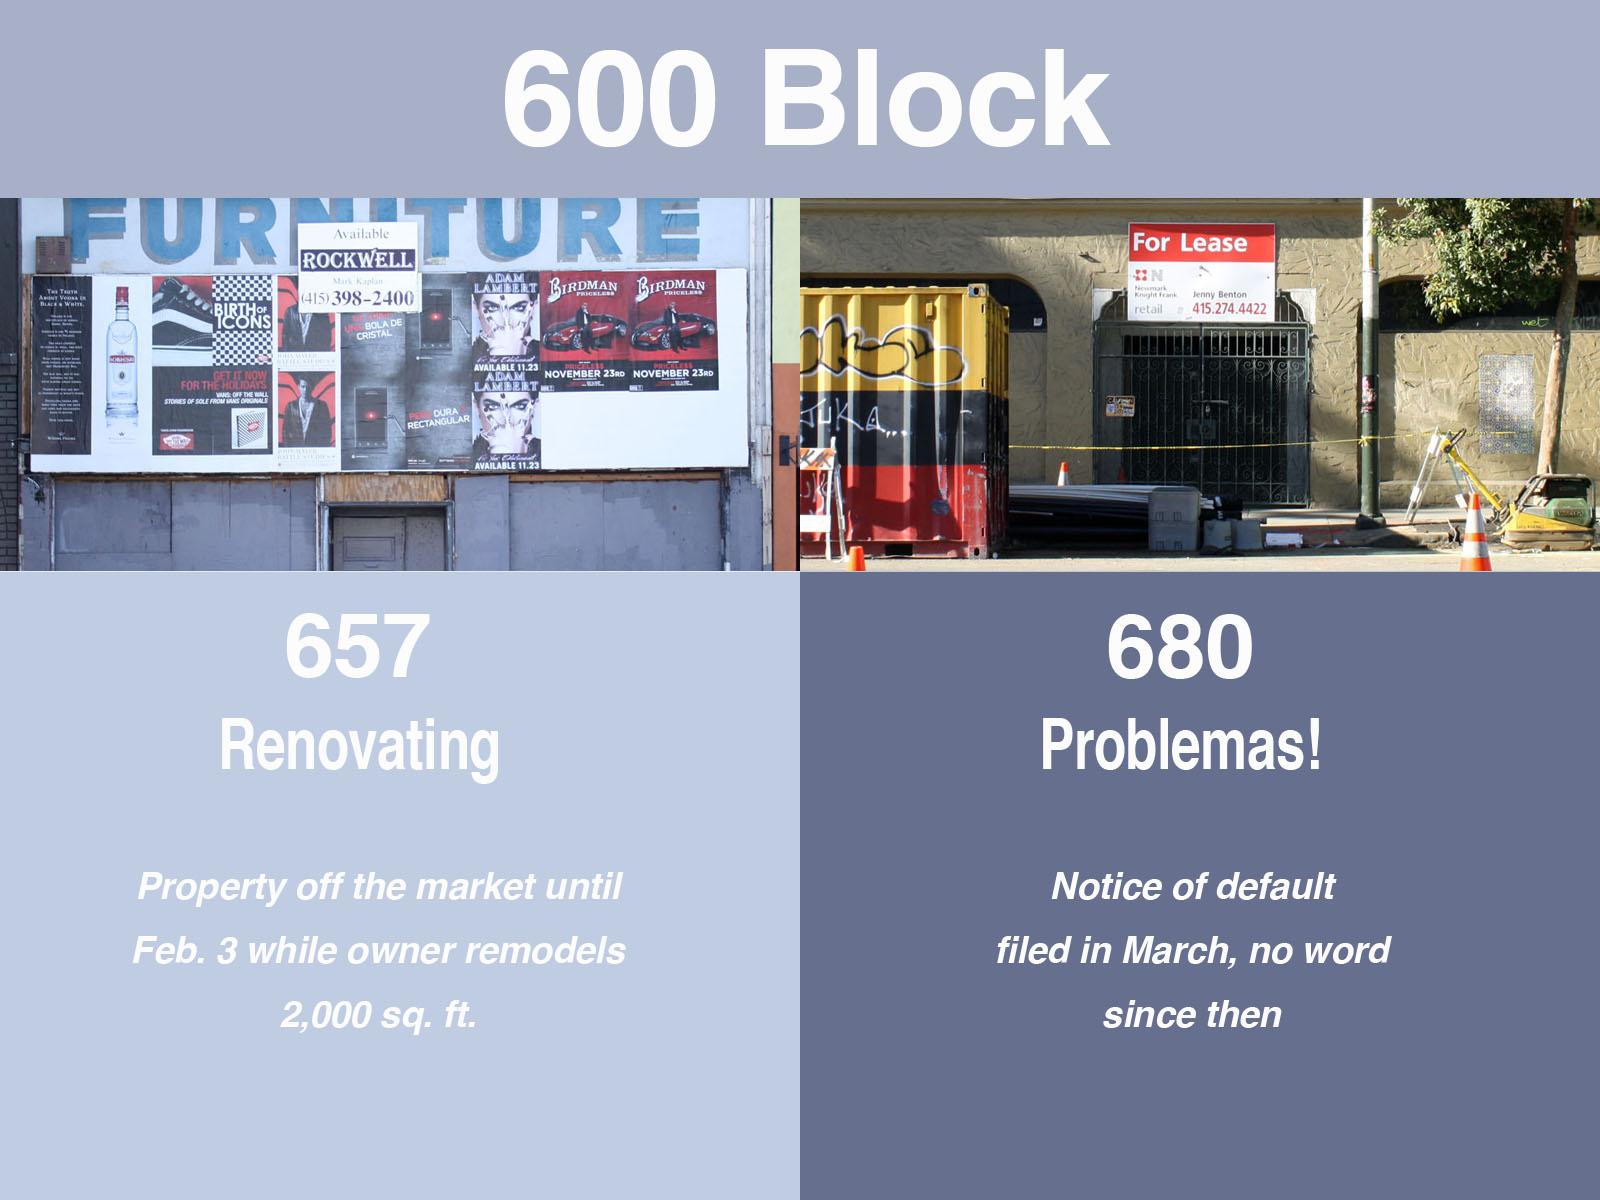 600 Block